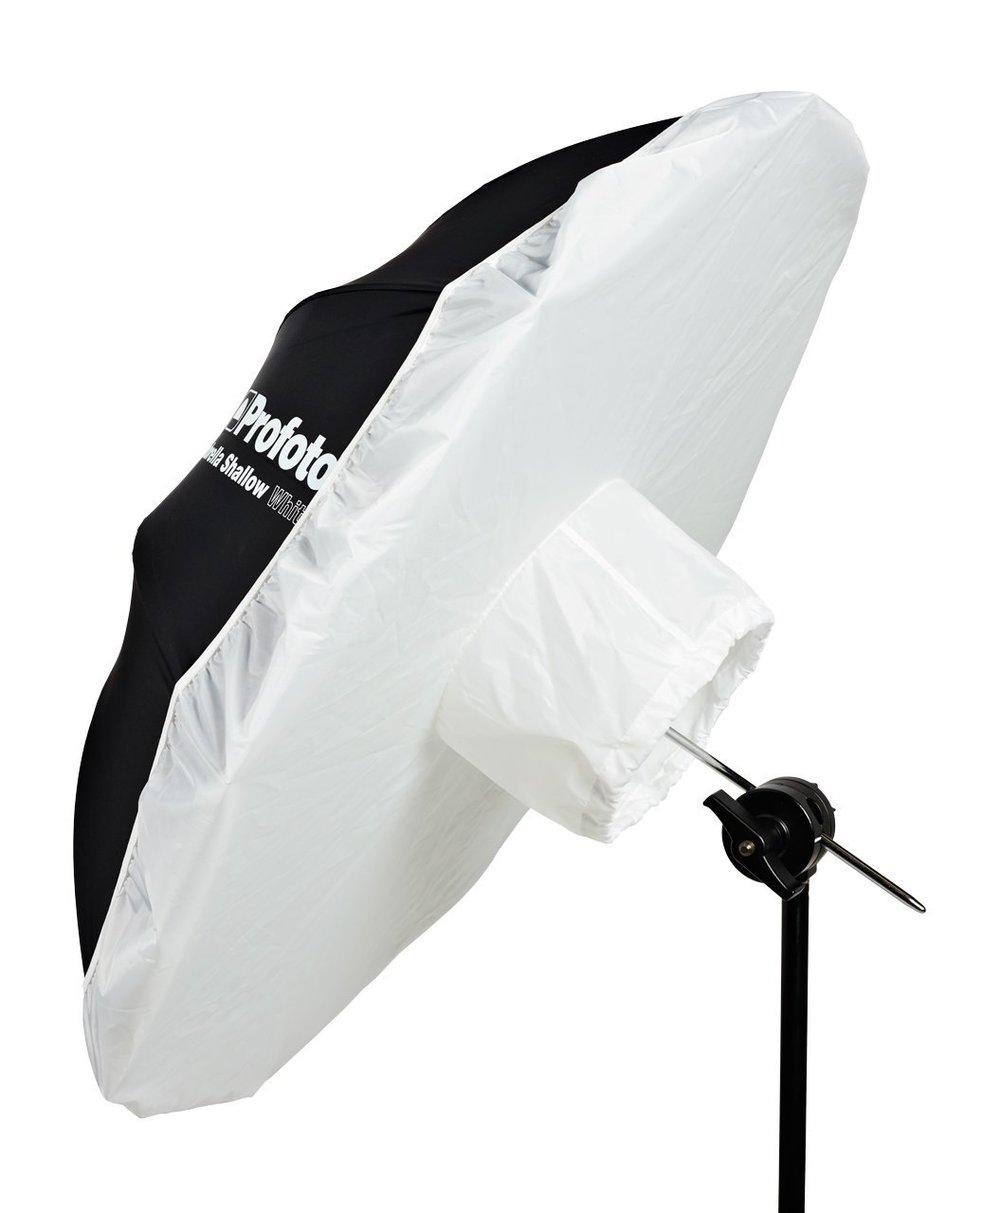 Profoto Modifier - Umbrella S Diffusor